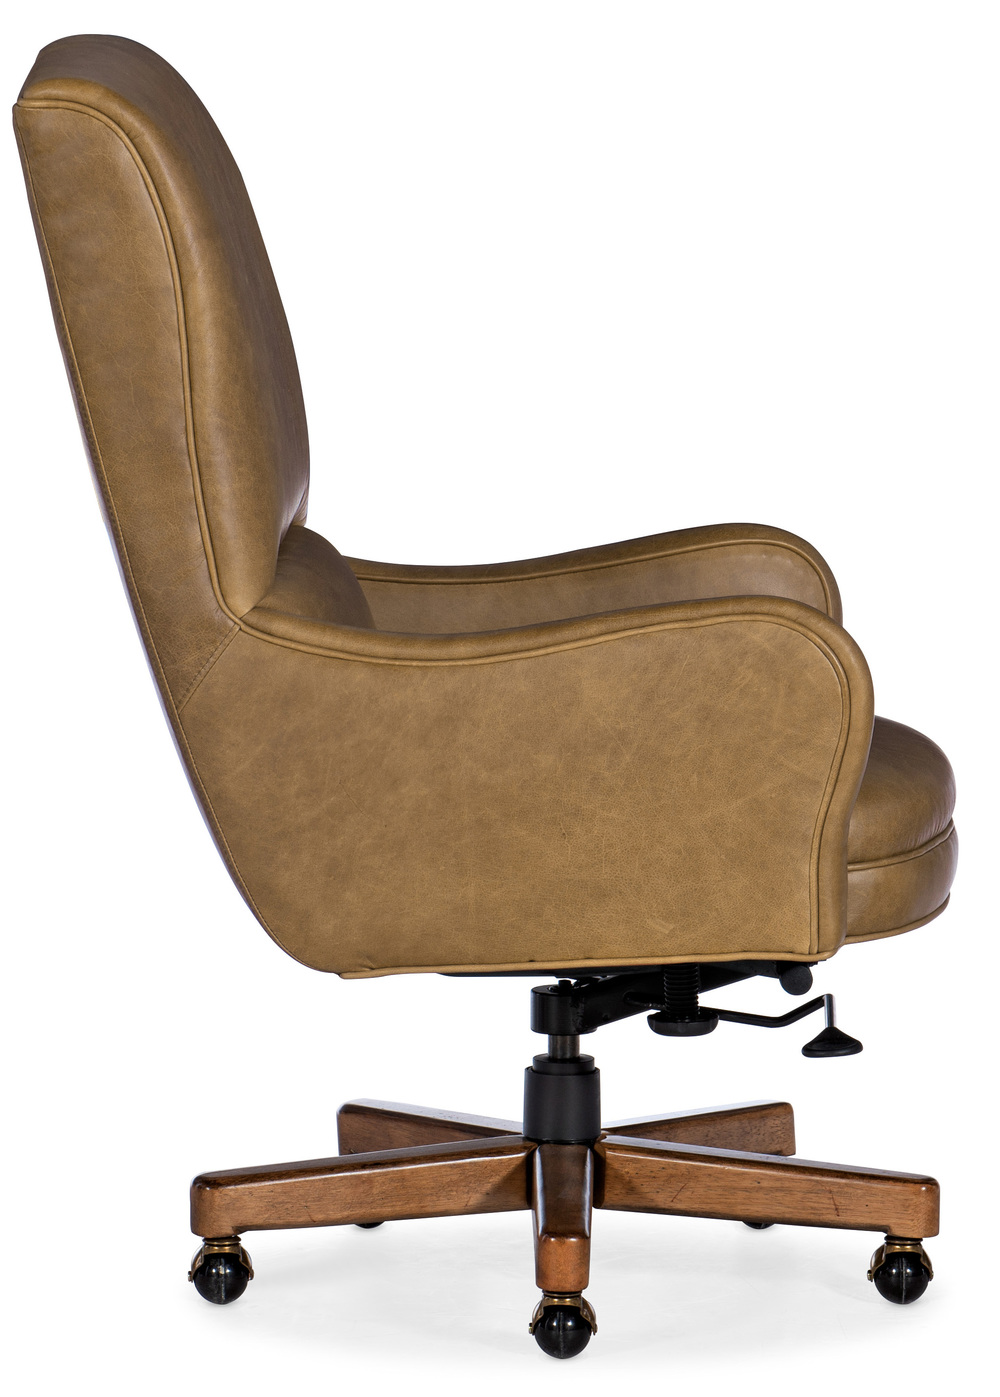 Hooker Furniture - Dayton Executive Swivel Tilt Chair with Metal Base